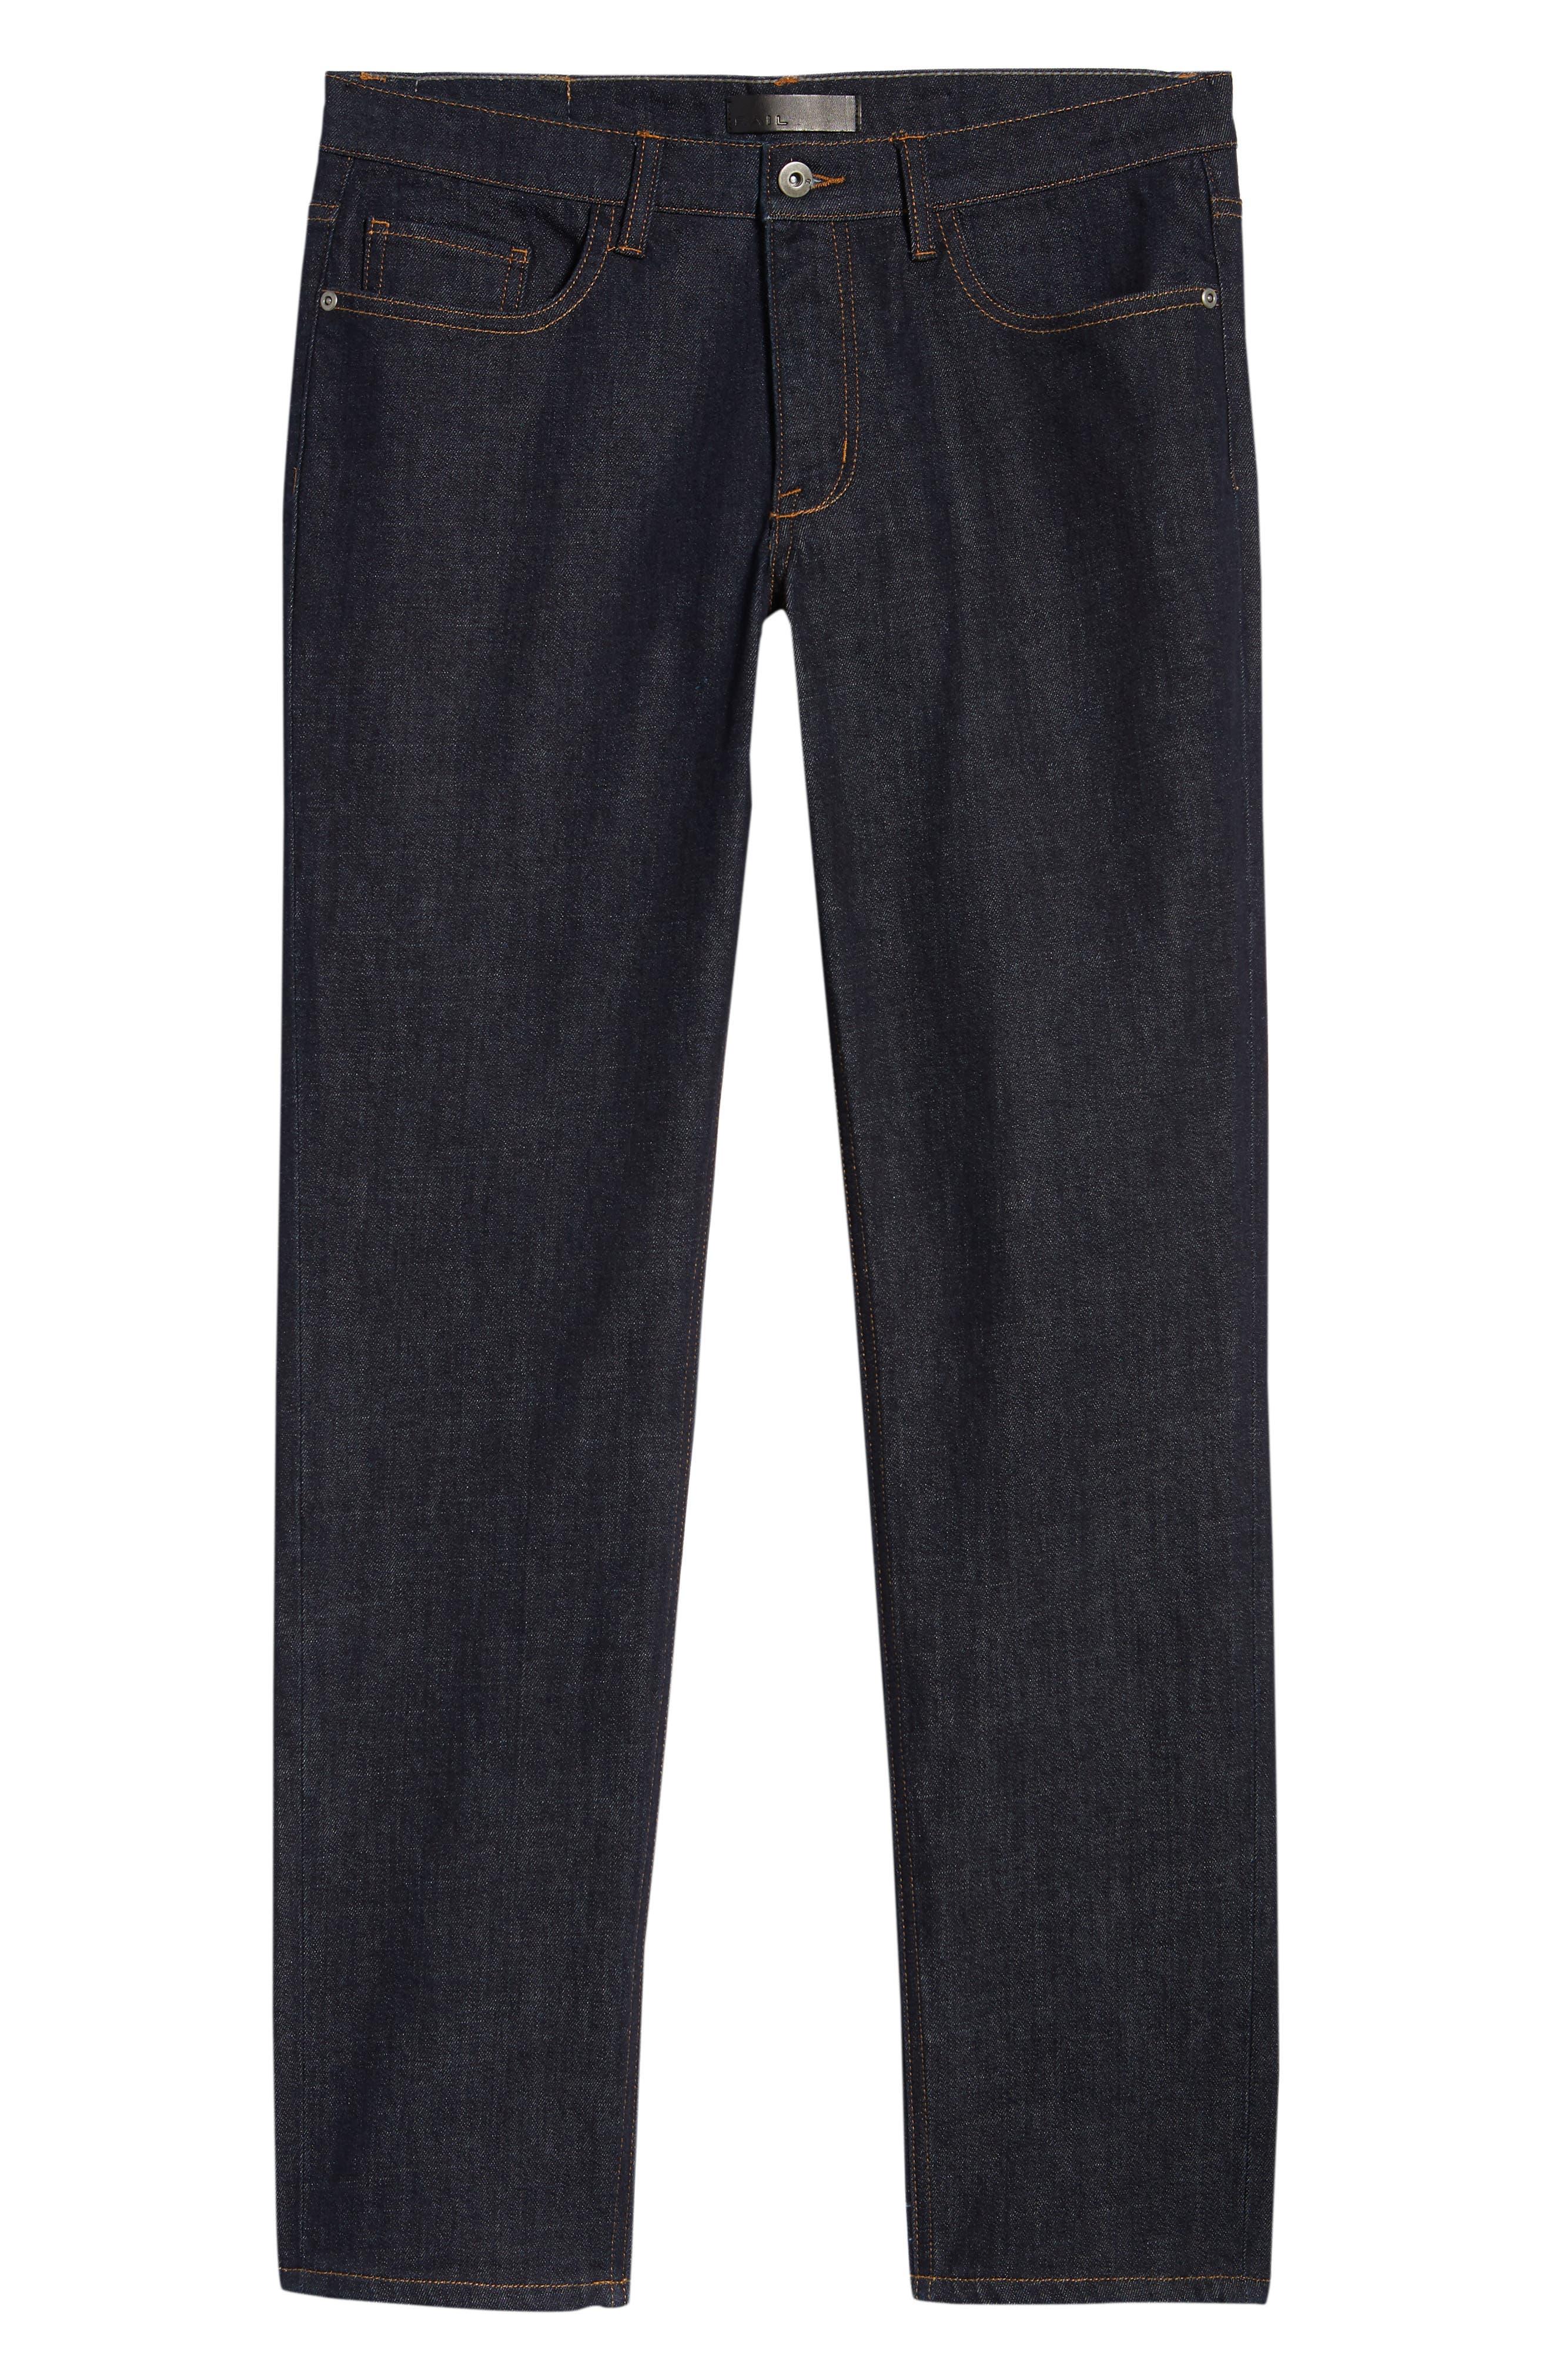 Stretch Slim Leg Jeans,                             Alternate thumbnail 6, color,                             BLUE PERRY WASH